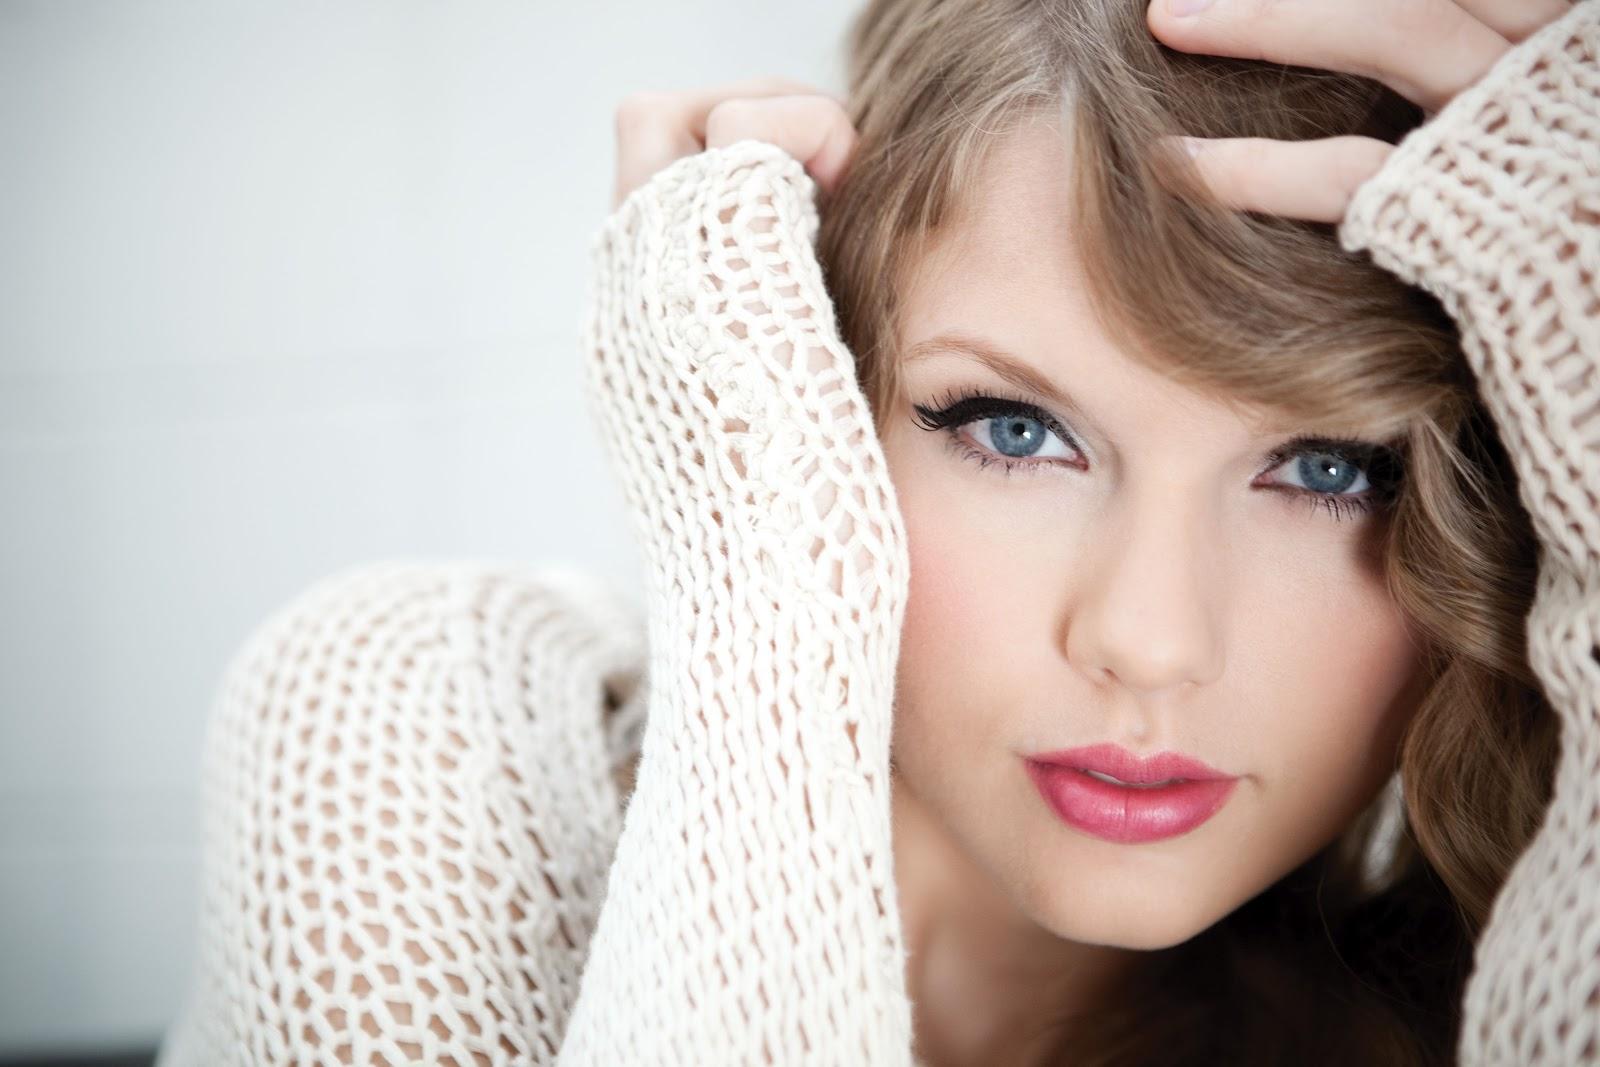 http://2.bp.blogspot.com/-FUioj1yfc3o/T3B_kDTg90I/AAAAAAAABRA/SnAbb8KBVMI/s1600/Taylor+Swift+003.jpg